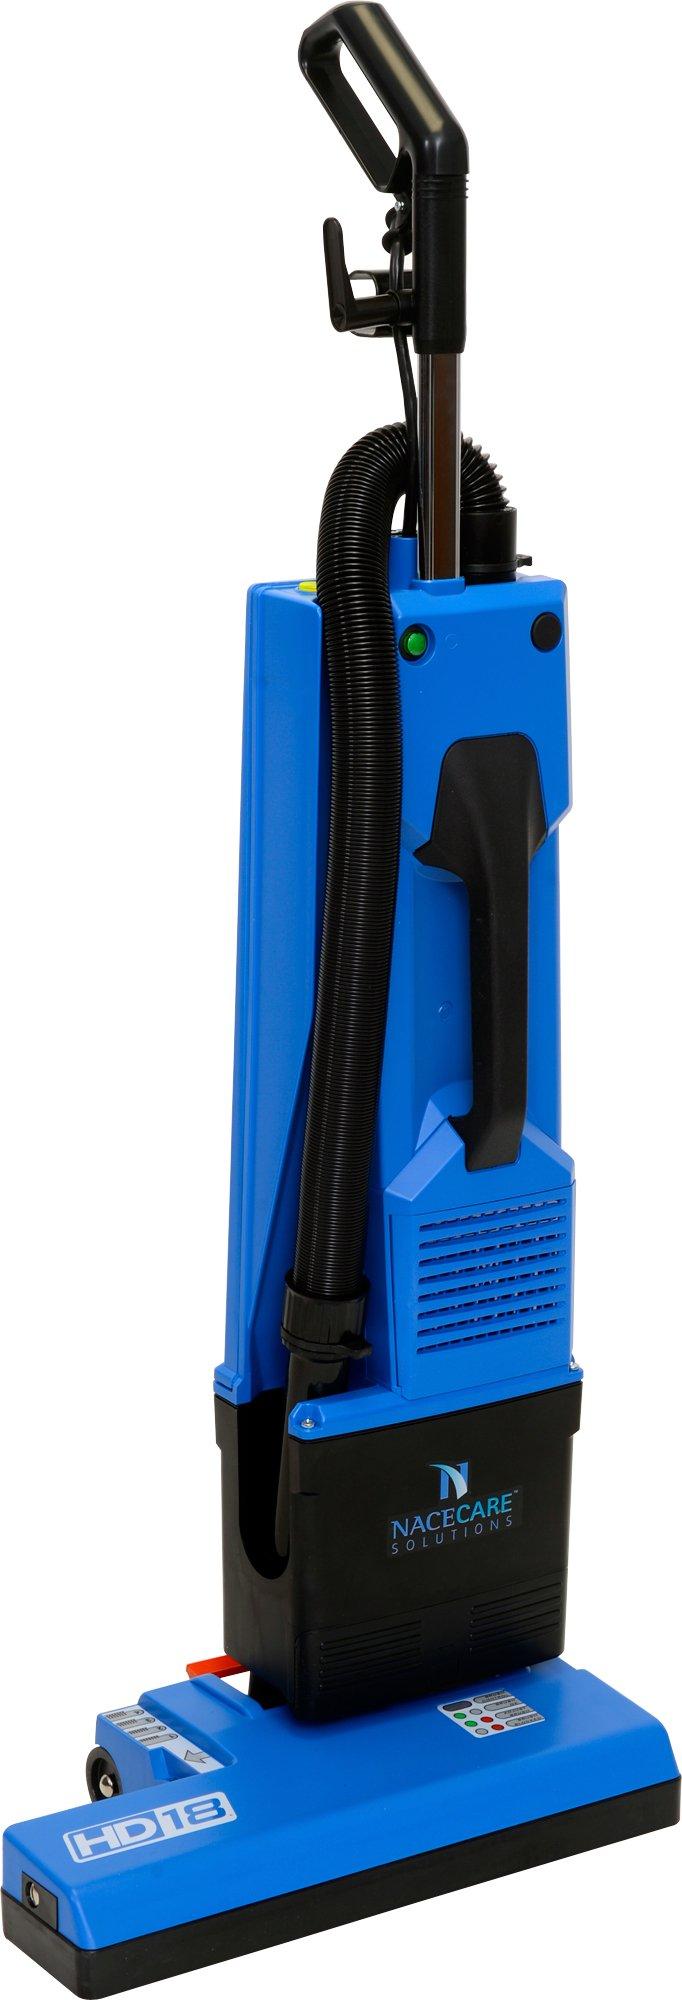 NaceCare HD 18 14'' Dual Motor Upright Vacuum, 6.5 qt Capacity, 300W Brush Motor, 3500 RPM